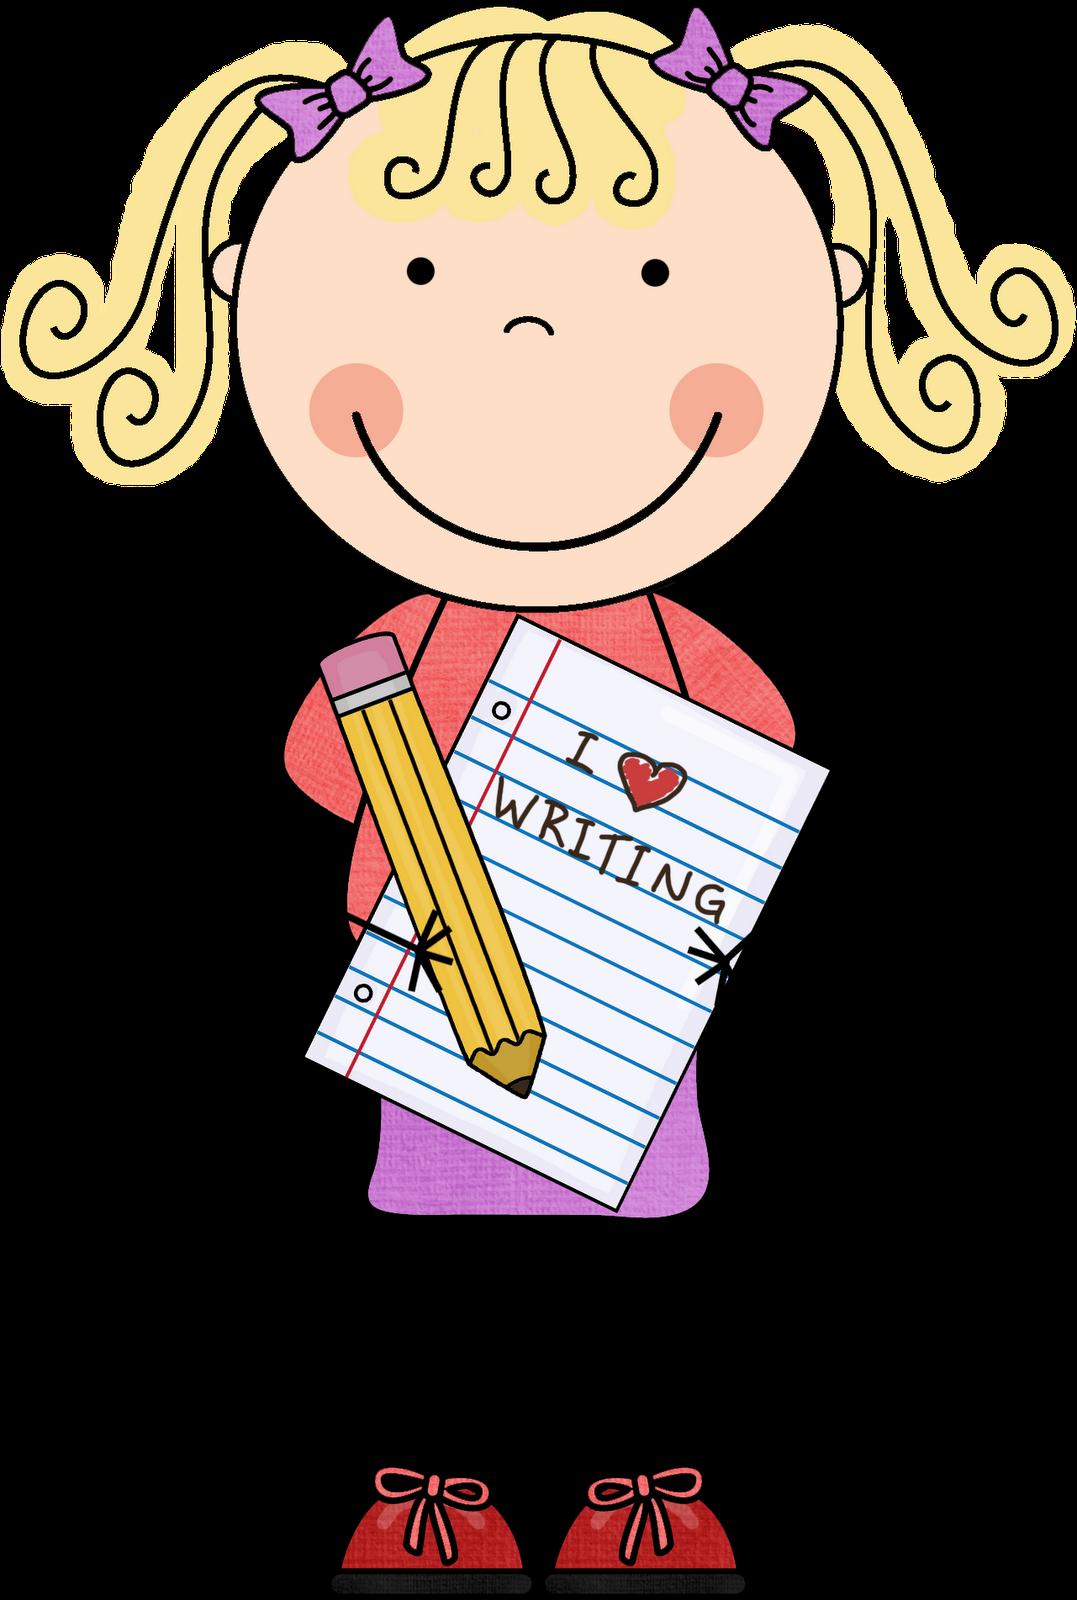 Student writing clipart-Student writing clipart-7